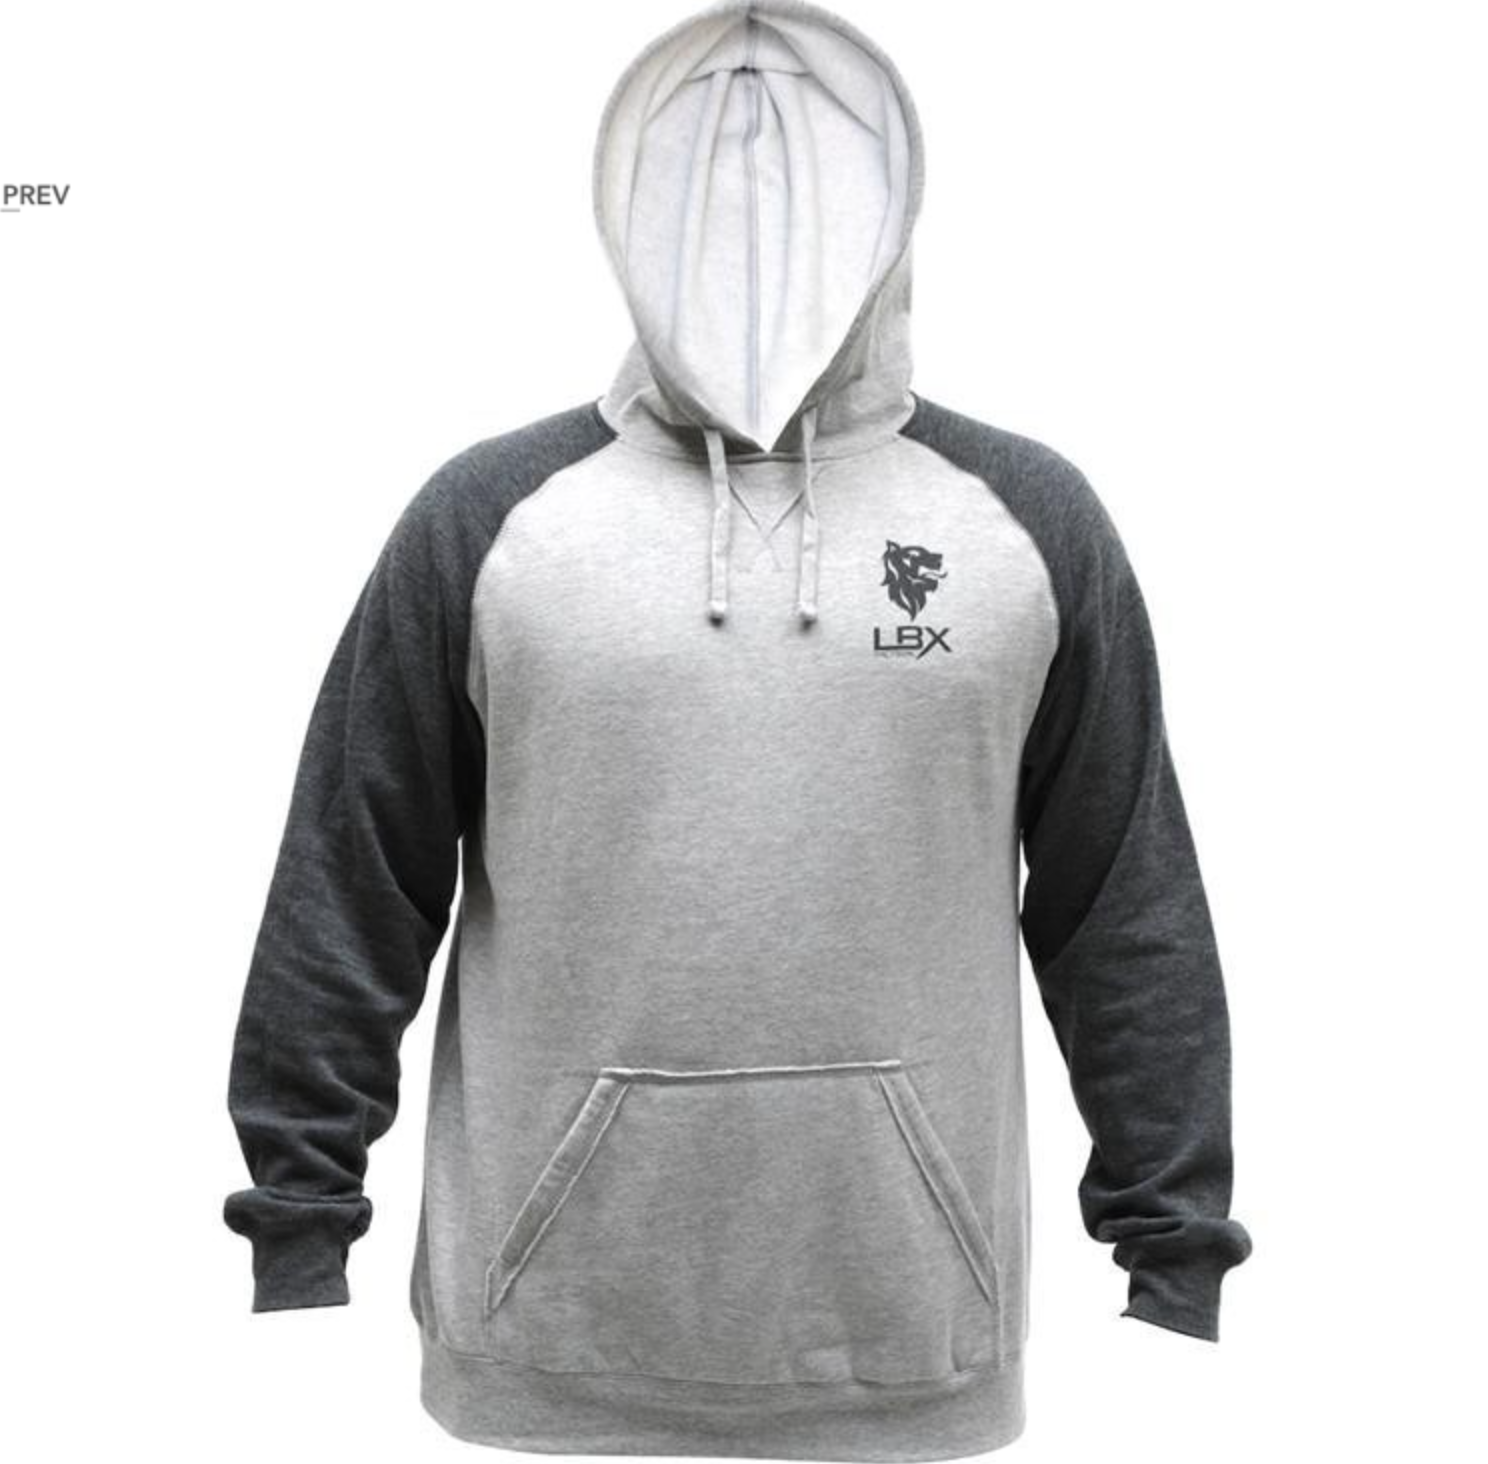 595f29c8 lbx-raglan-hoodie-24312-p.png